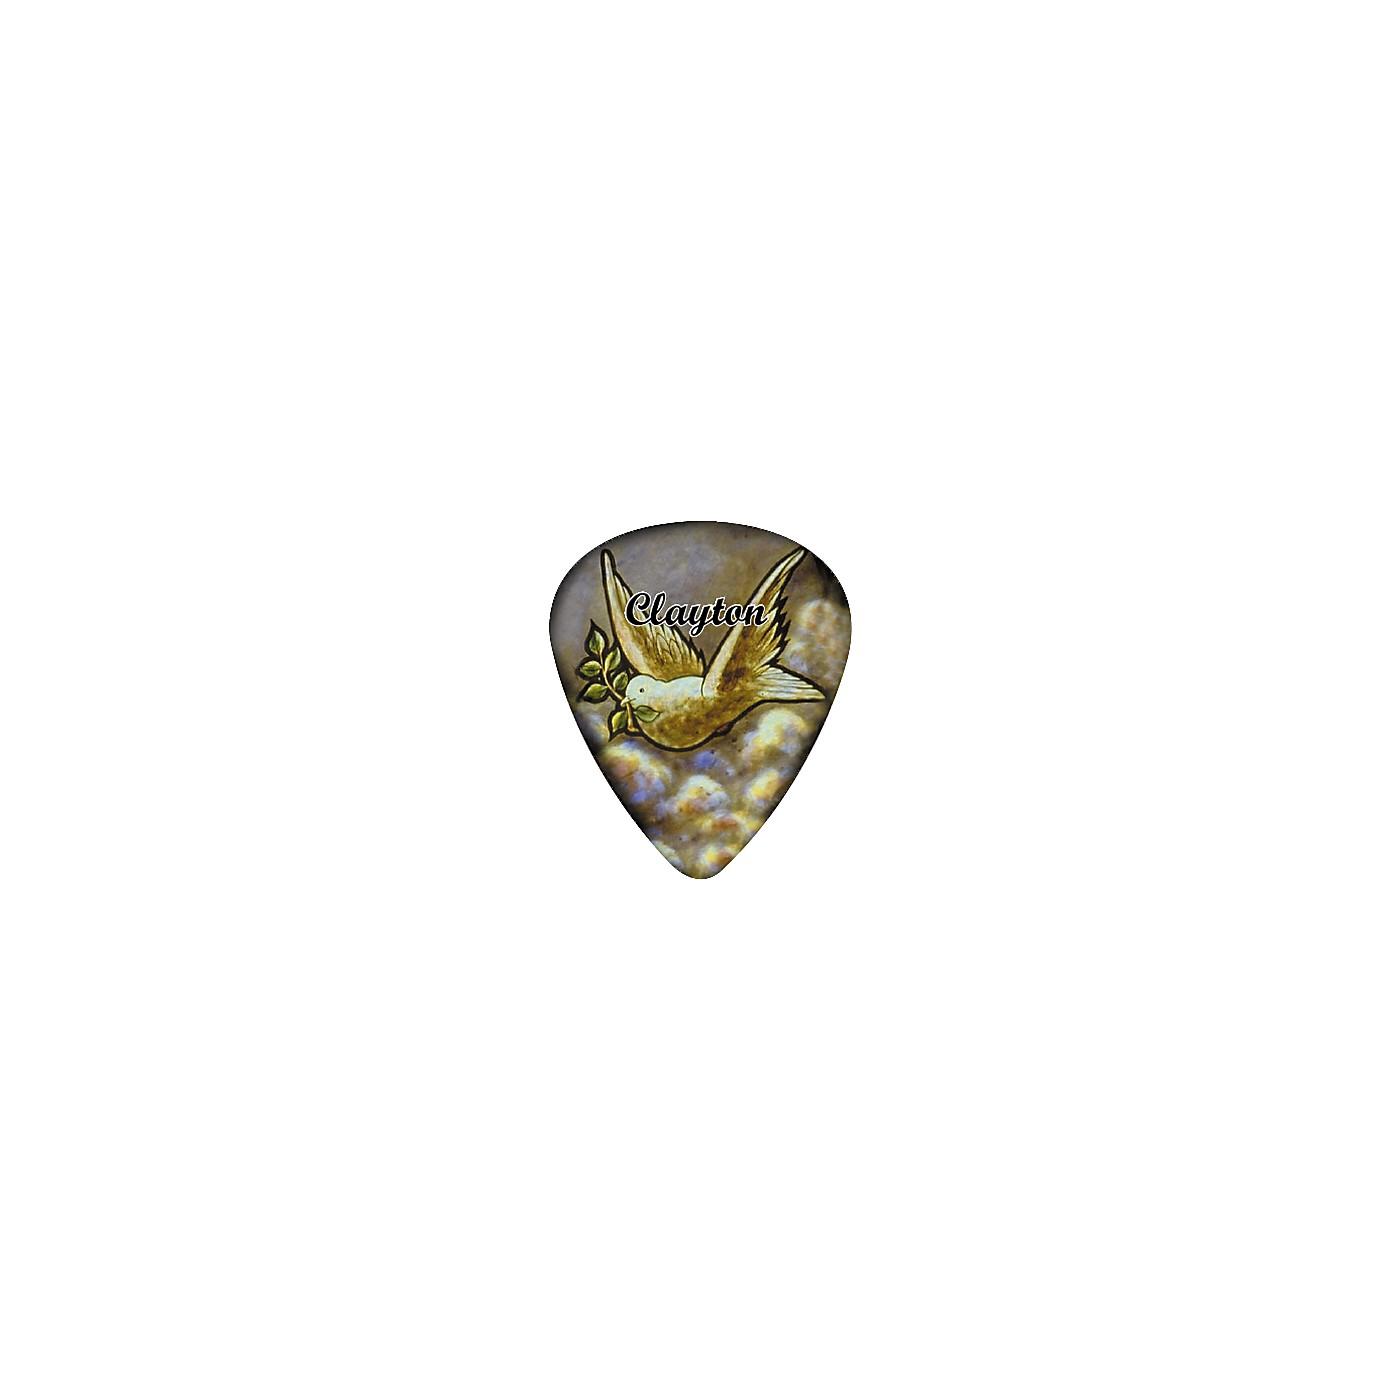 Clayton Dove Guitar Pick 12 Pack thumbnail